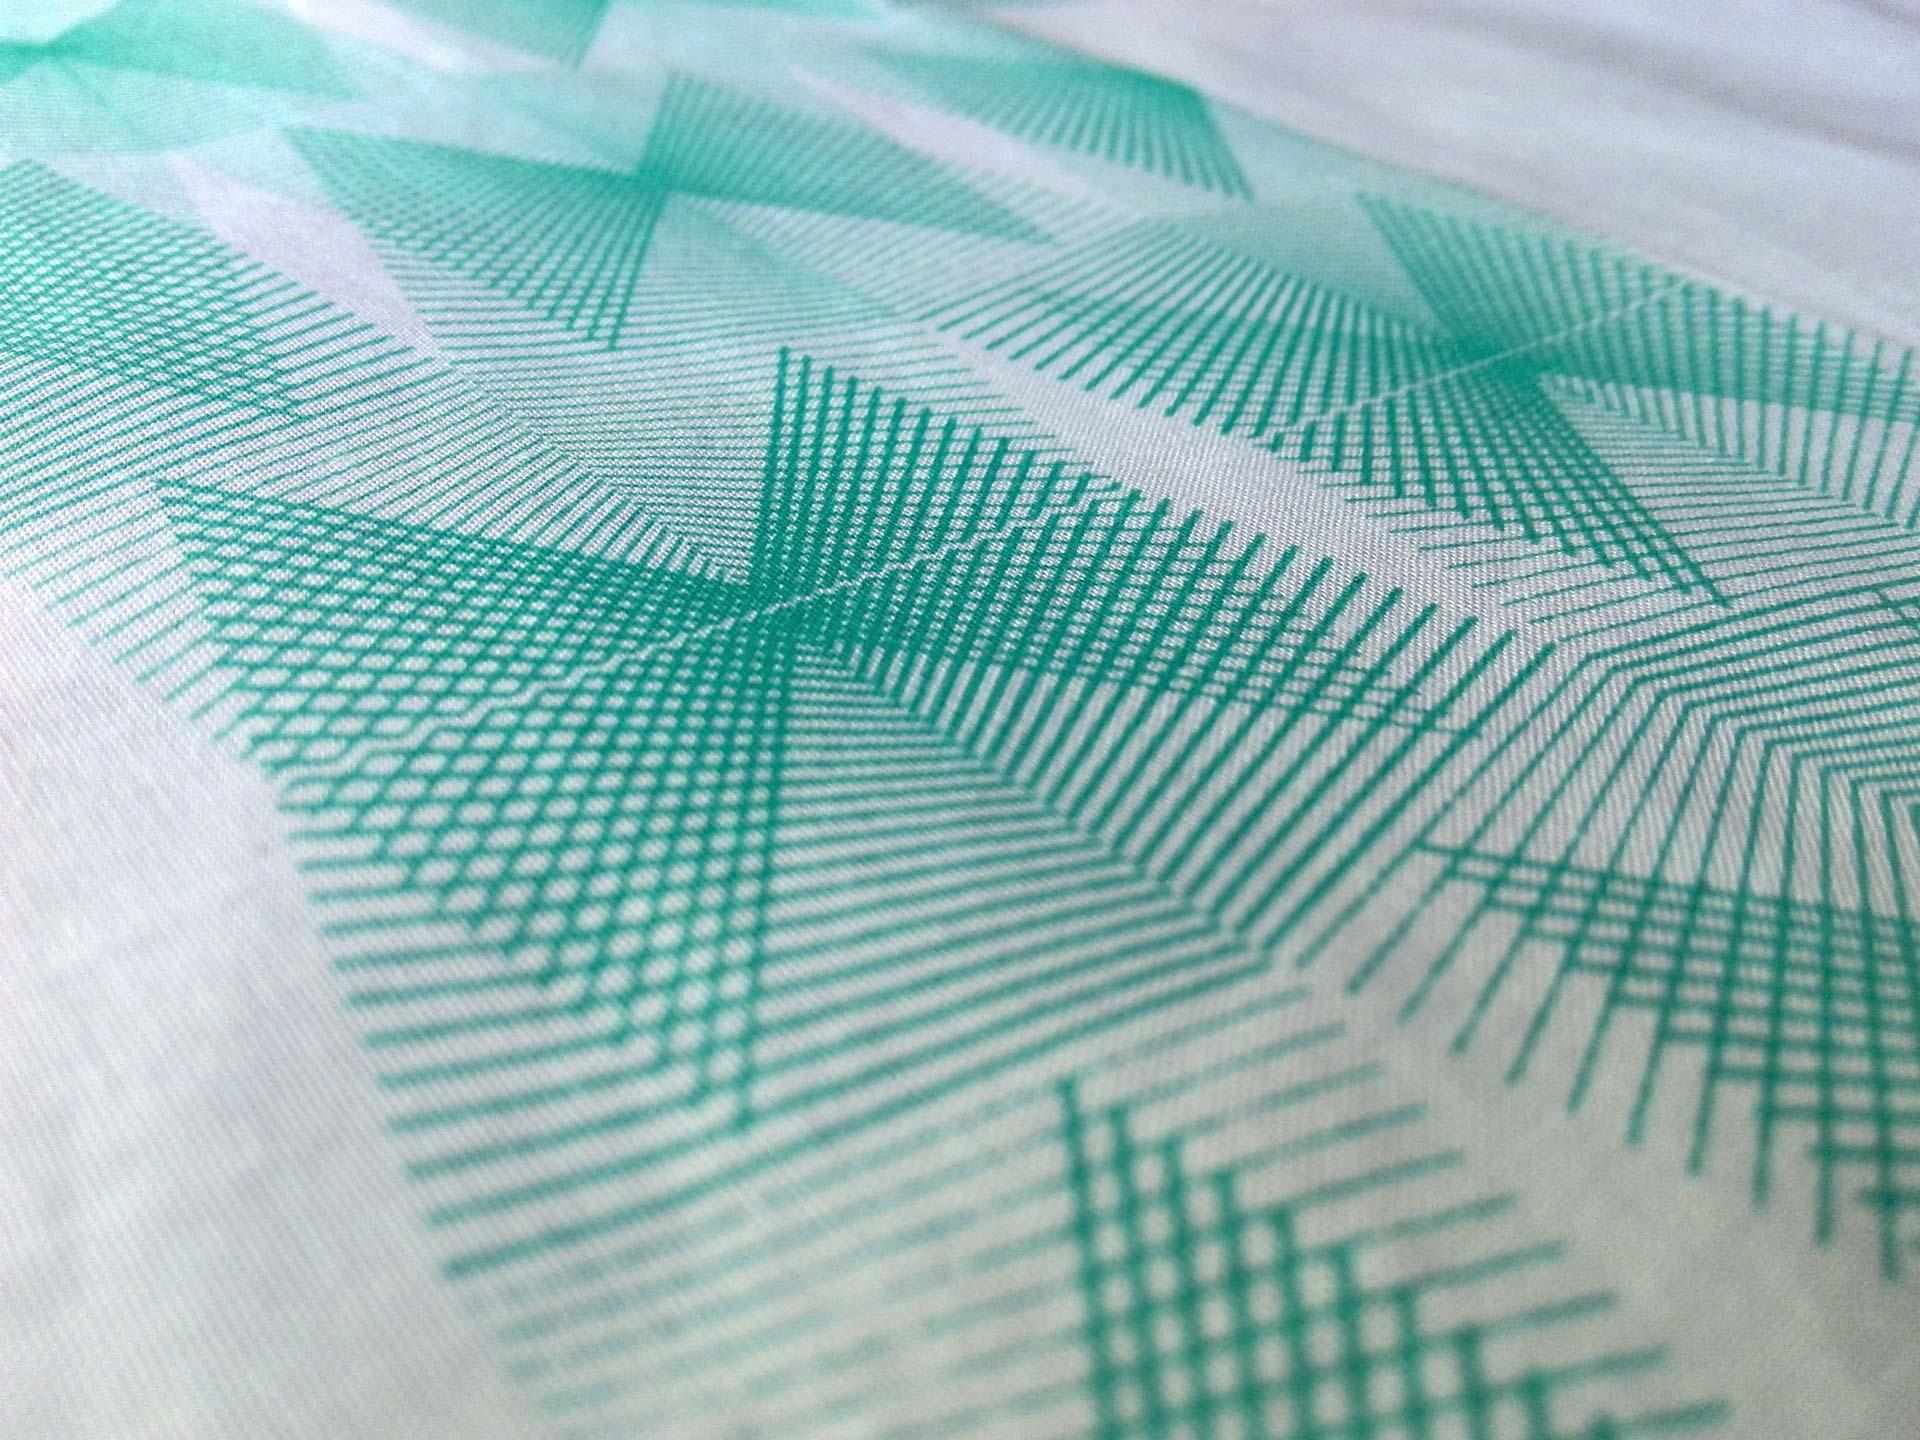 cloths4.jpg